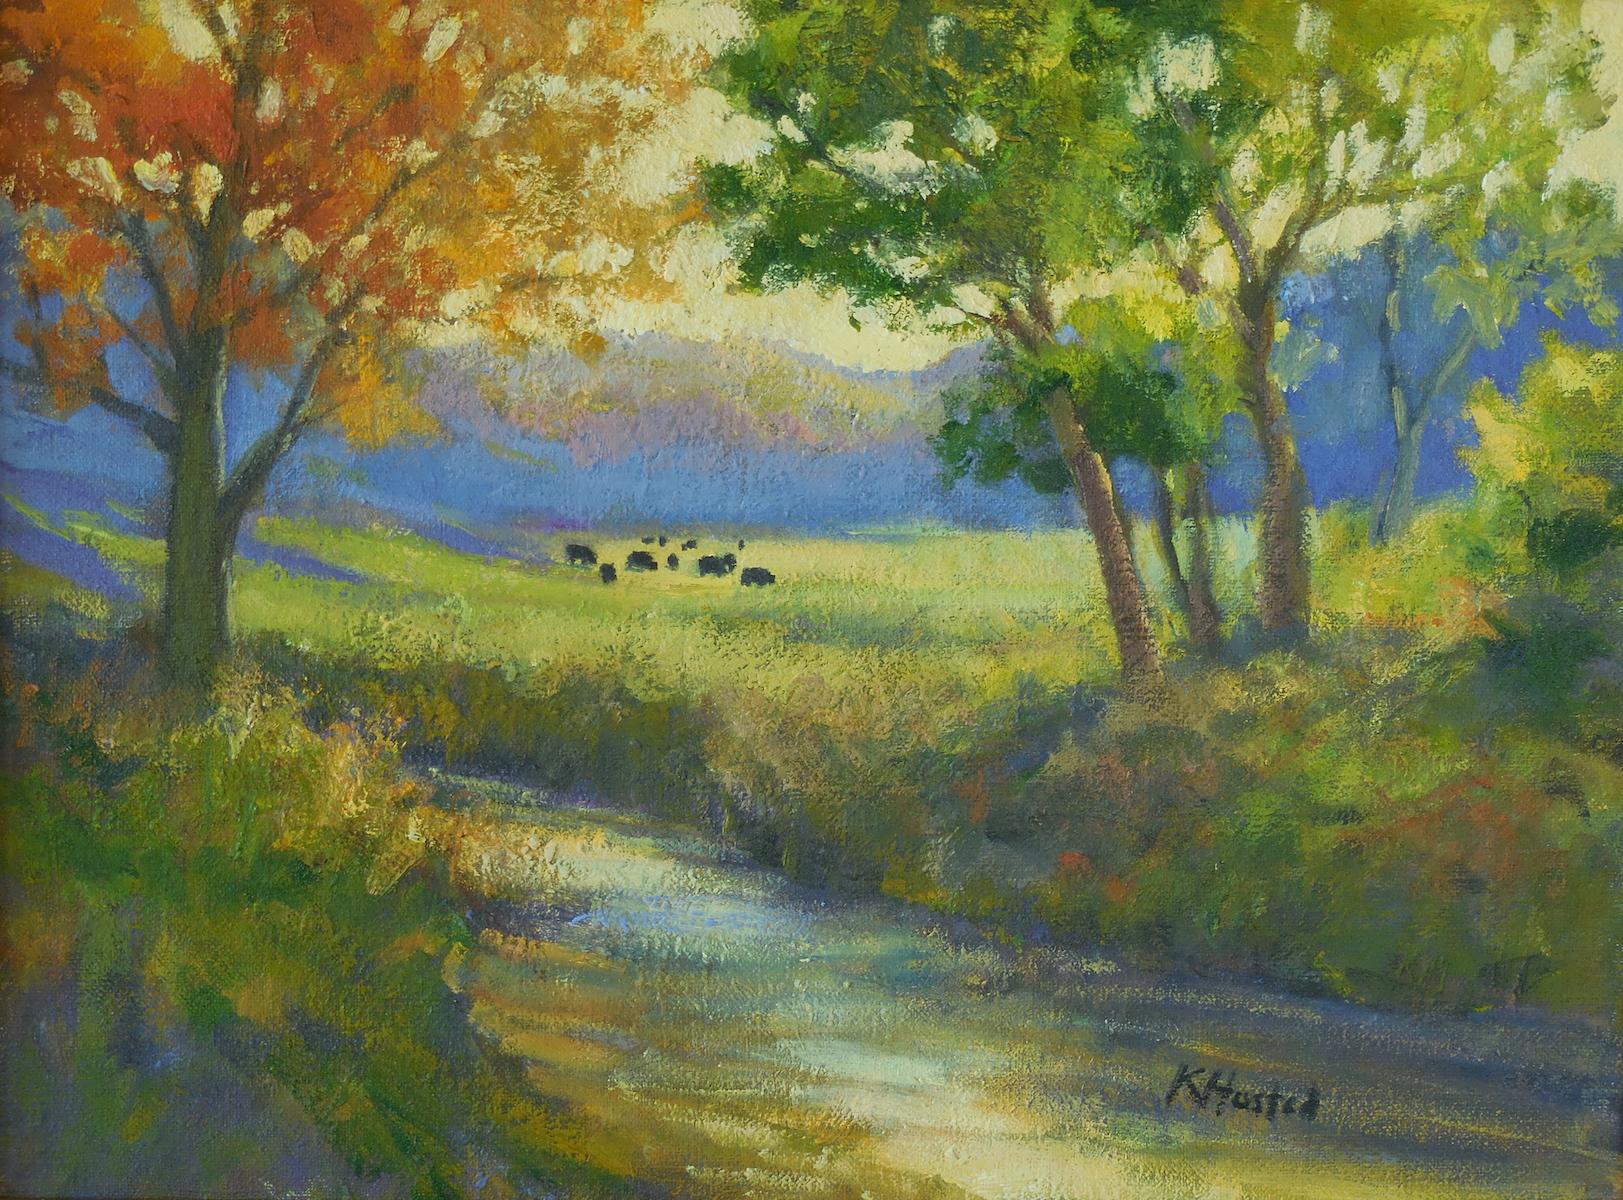 Cows Grazing 12x16